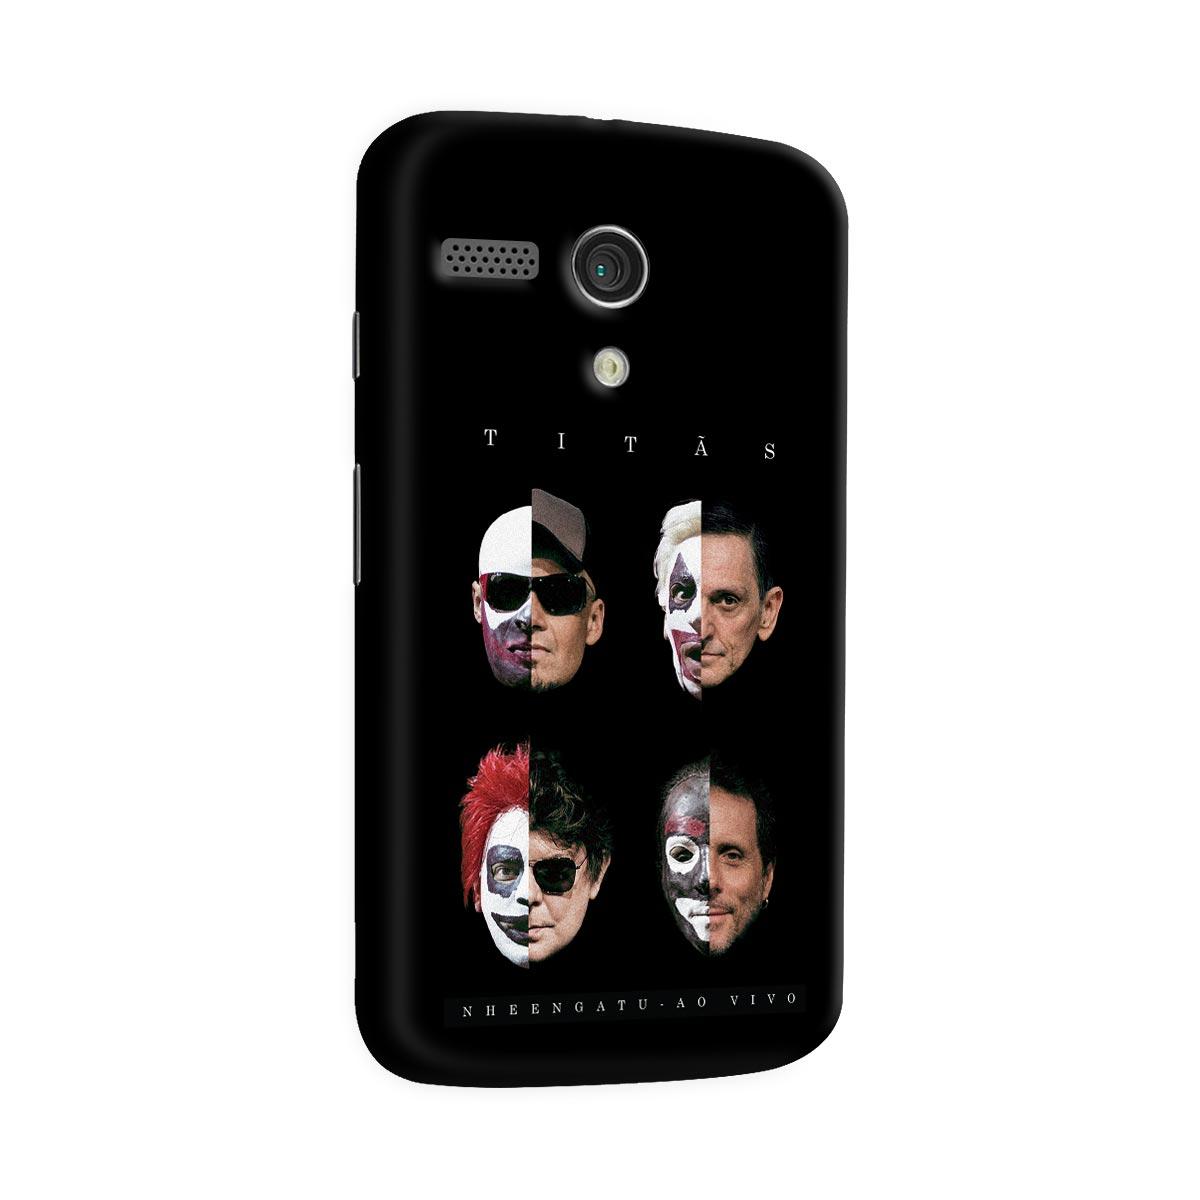 Capa para Motorola Moto G 1 Tit�s Capa Nheengatu Ao Vivo